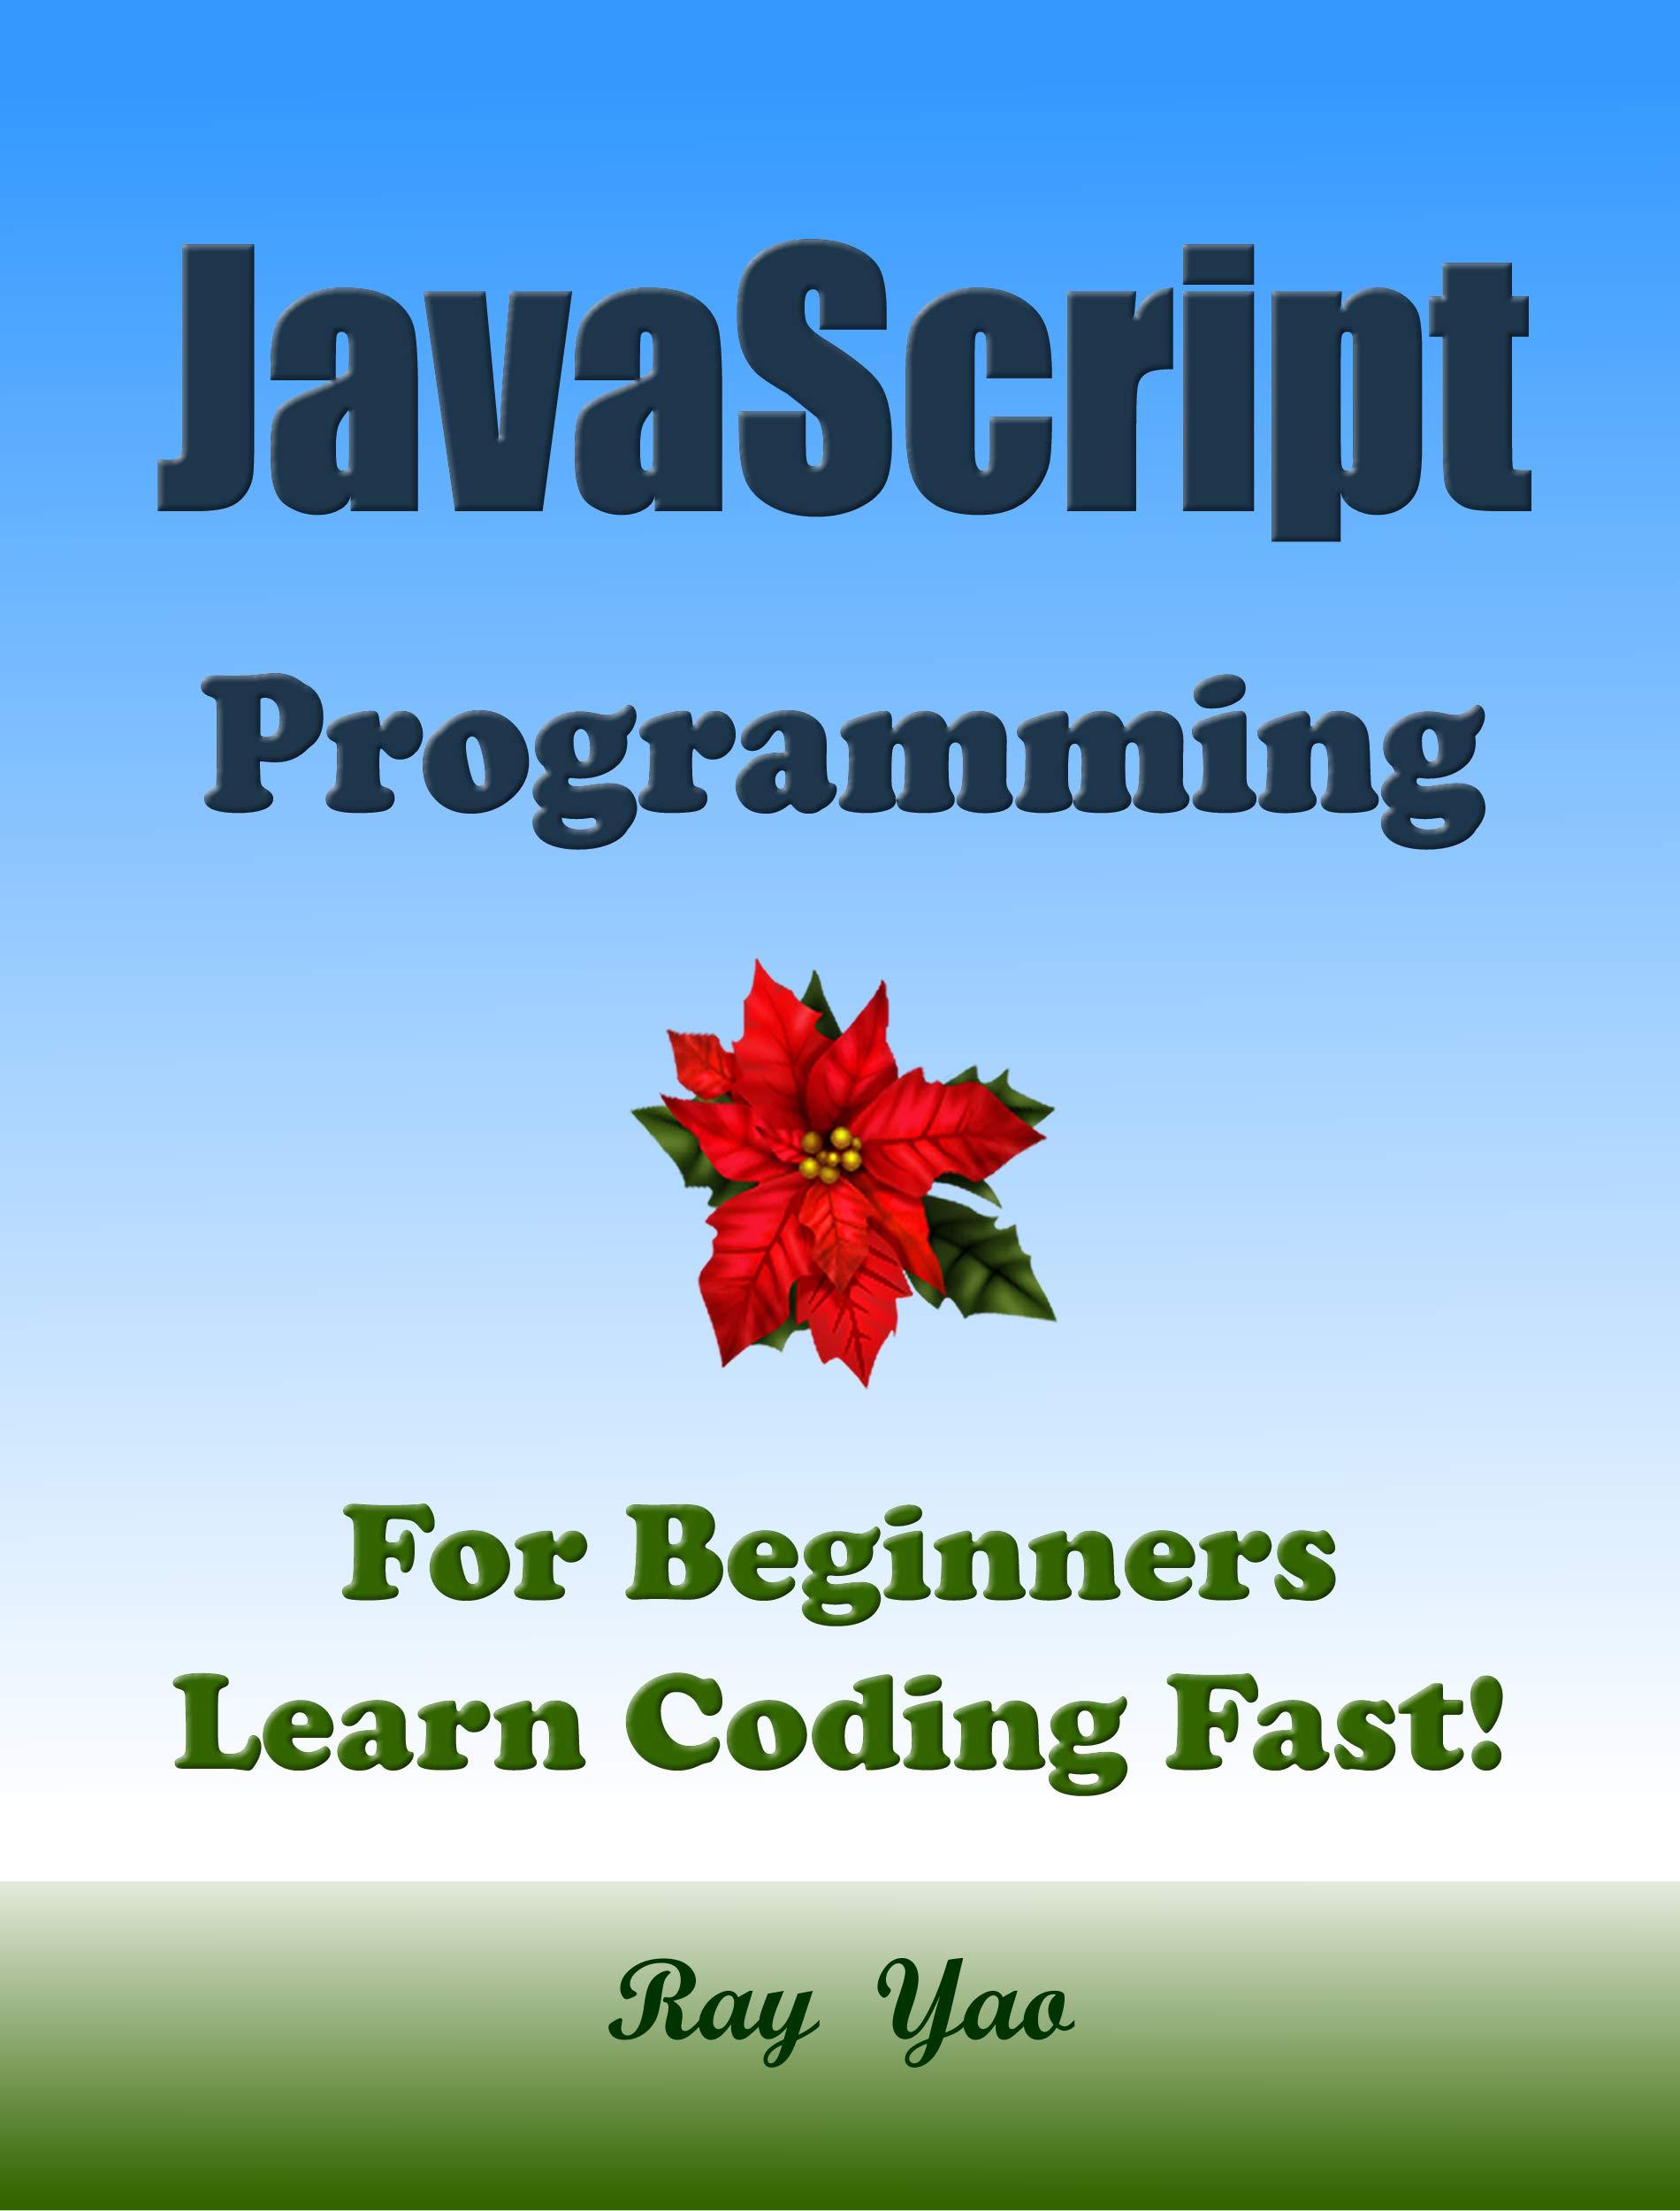 JAVASCRIPT Programming, For Beginners, Learn Coding Fast!